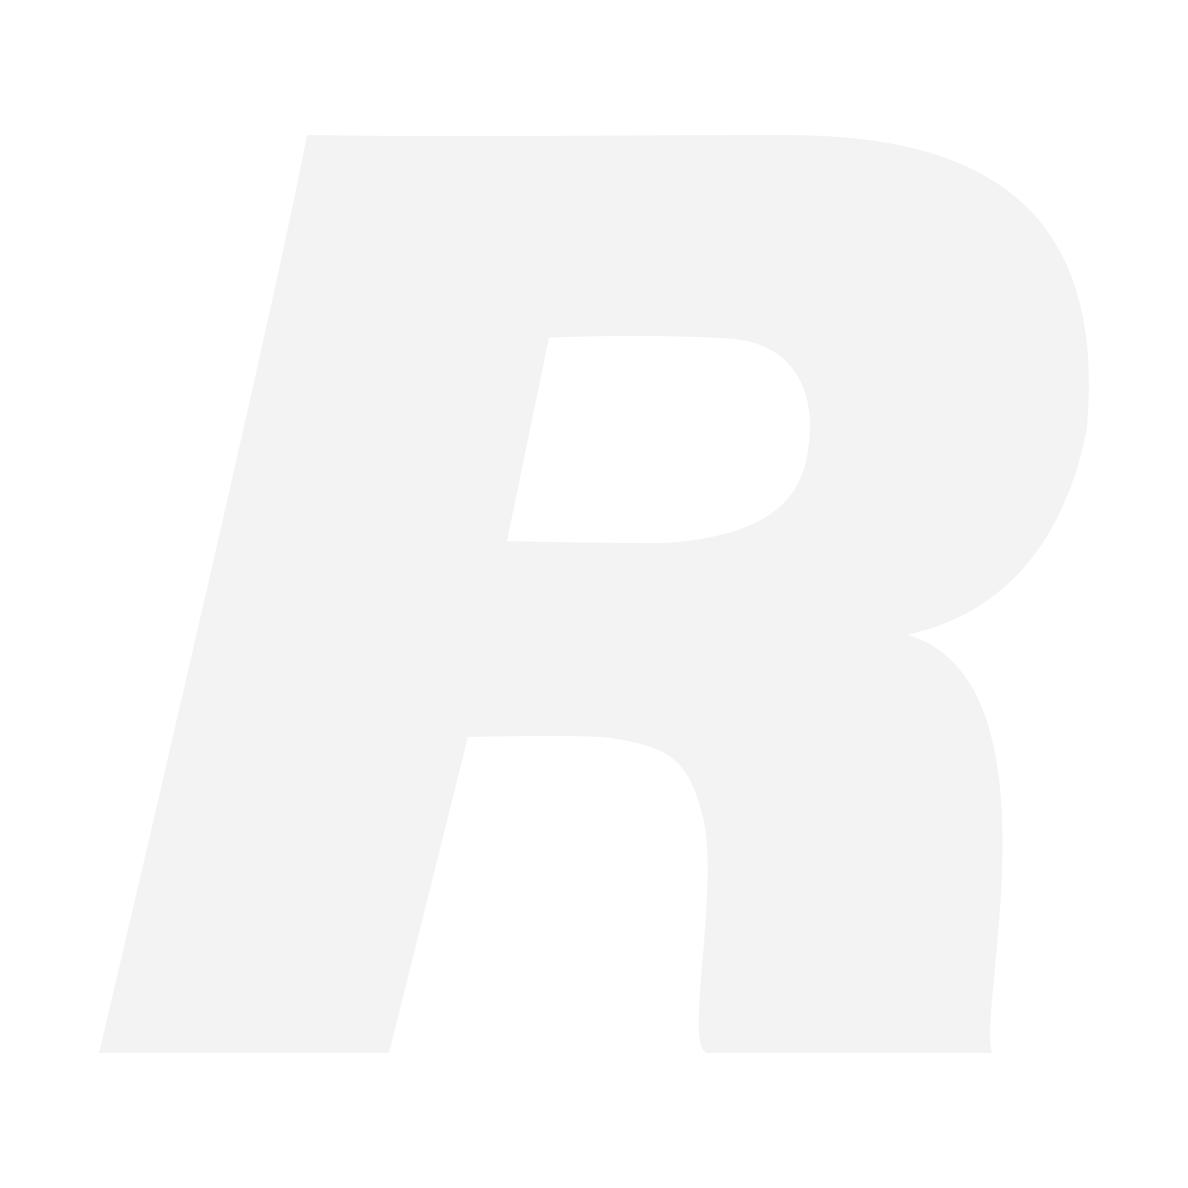 Manfrotto Pixi Evo Mini Tripod, musta (MTPIXIEVO-BK)